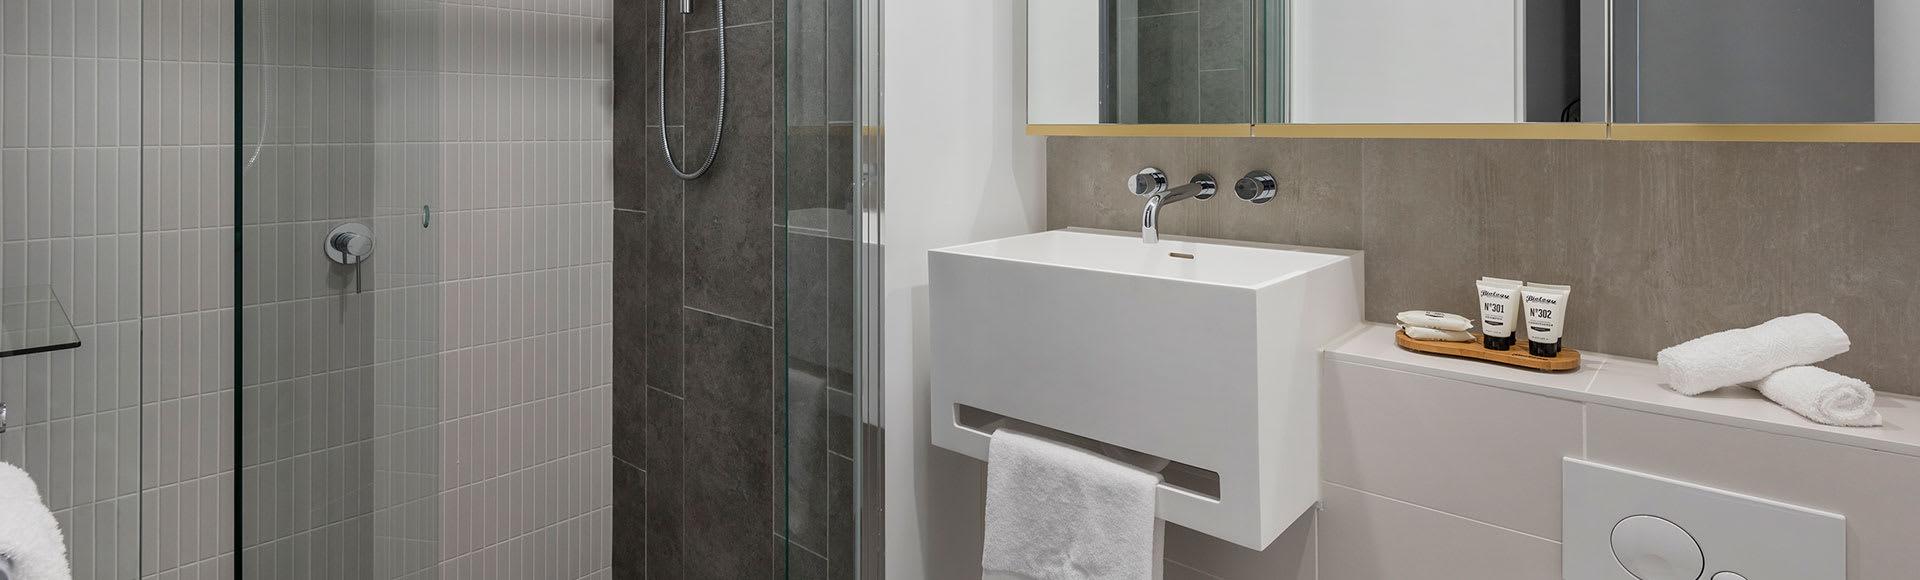 Avani Melbourne Central Residences 2 Bedroom Superior Suite Bathroom